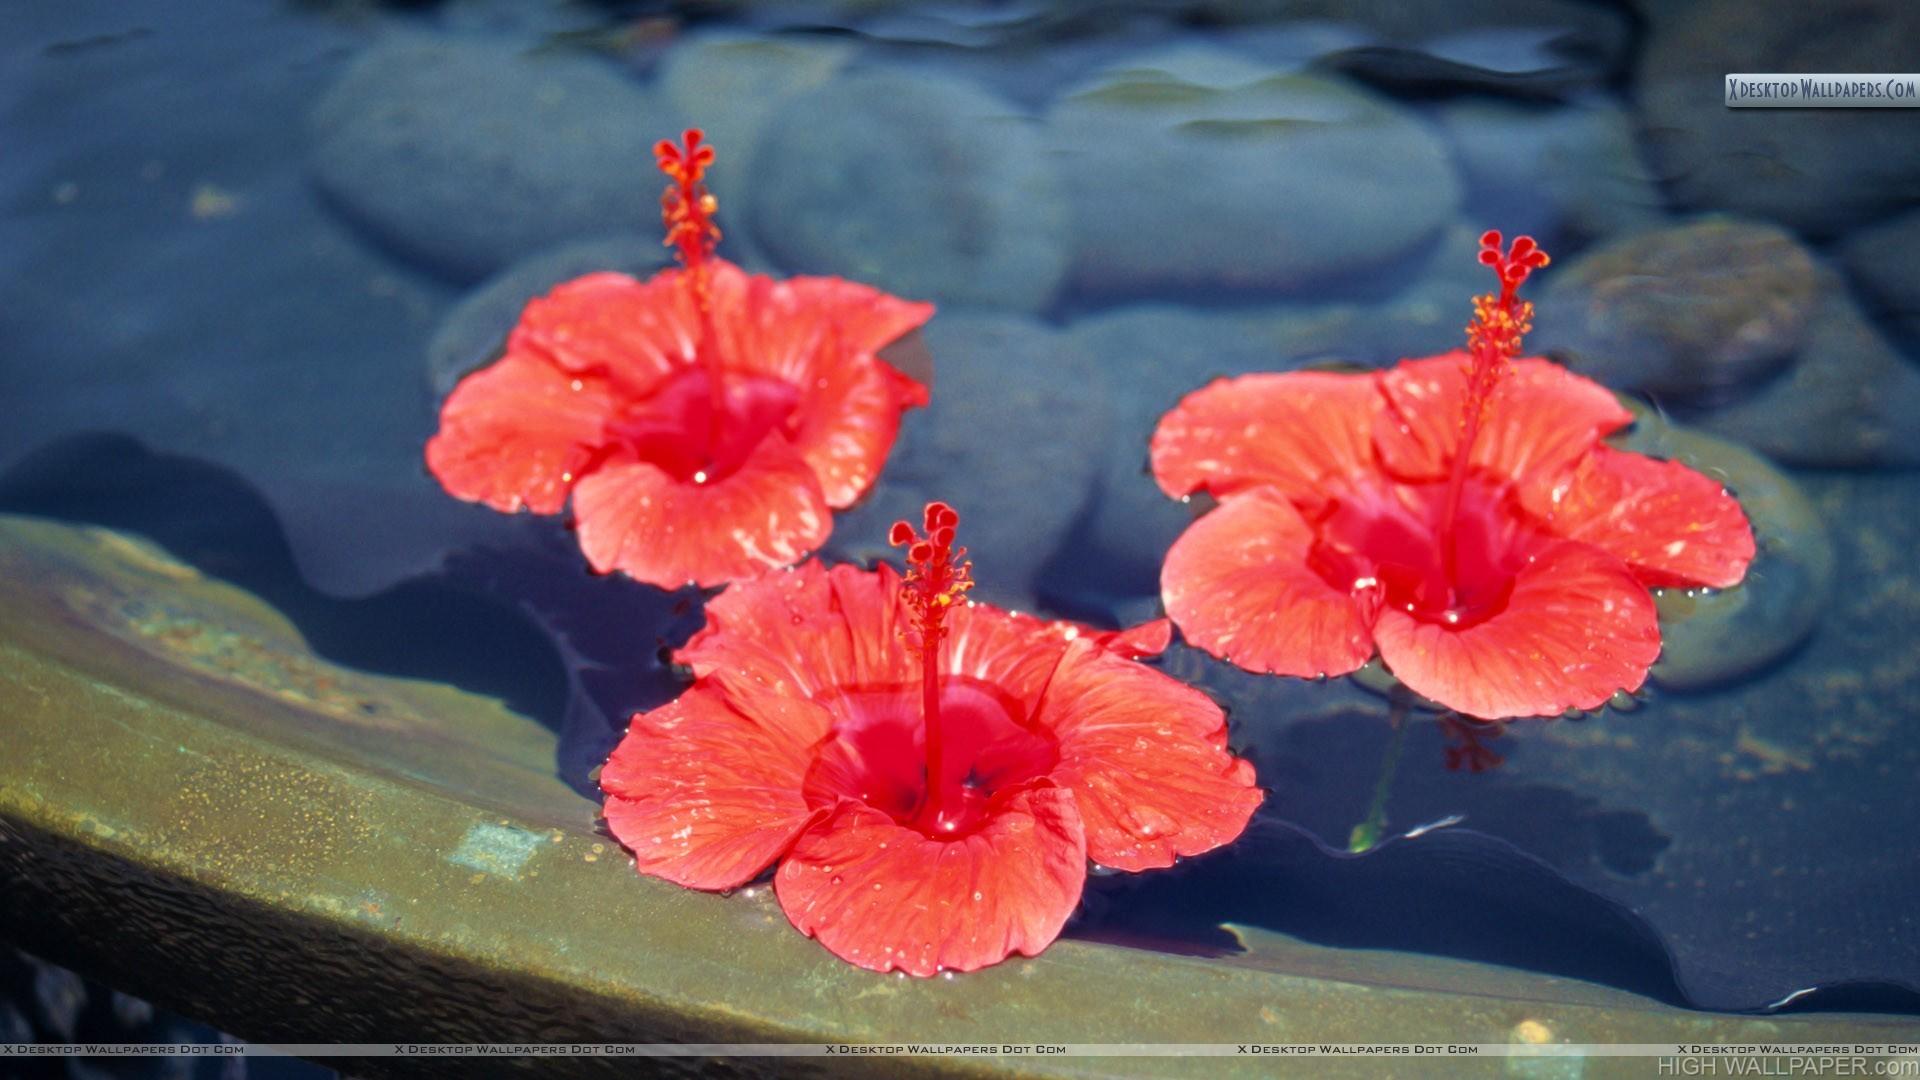 Three Orange Flowers Floating on Water